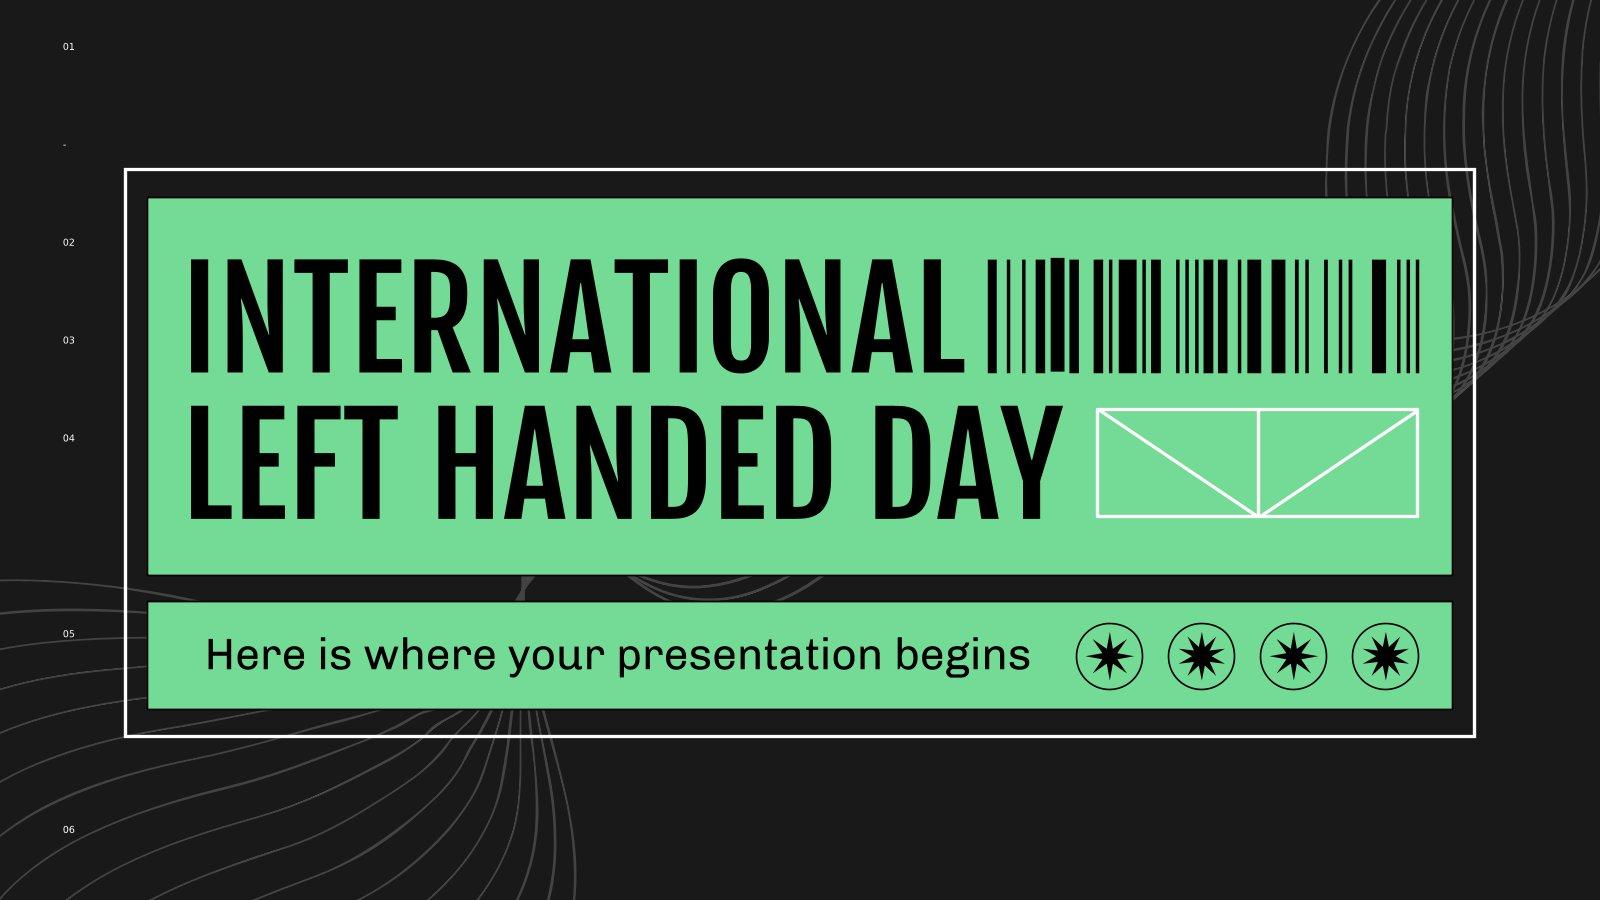 International Left Handed Day presentation template